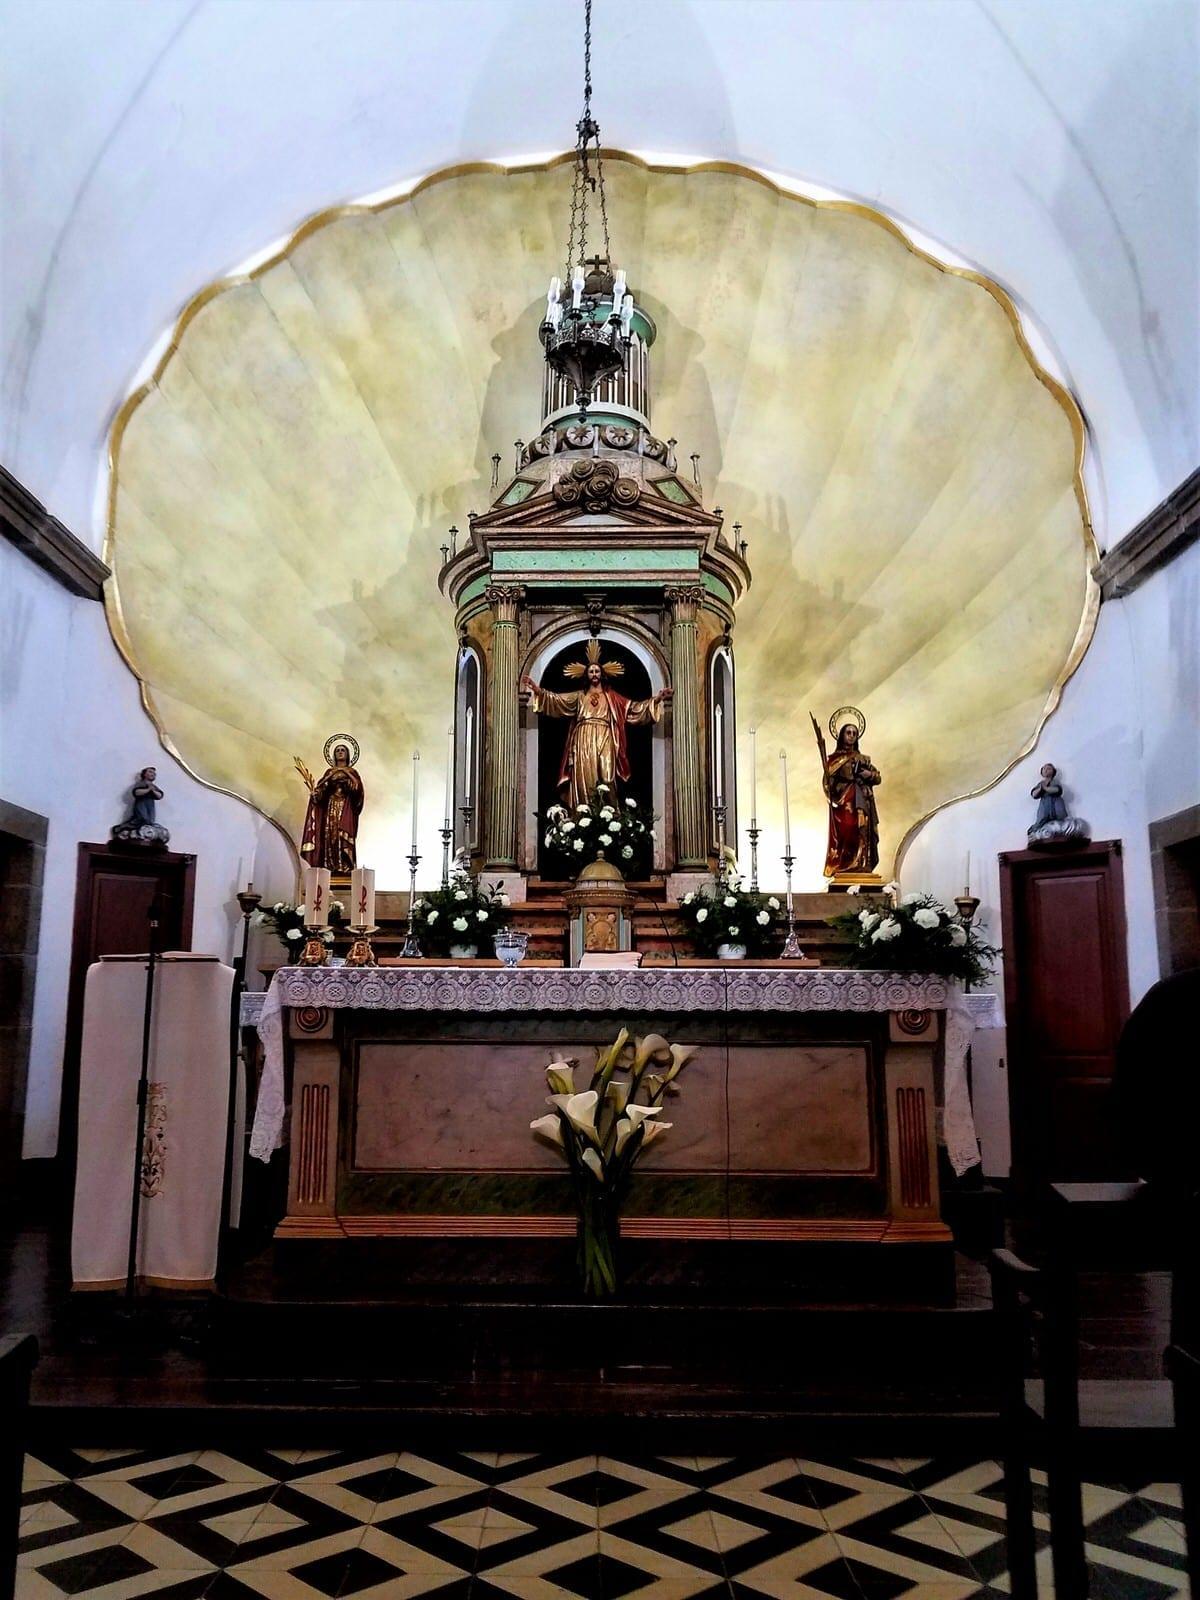 camino de santiago: expect rain walking galicia in april